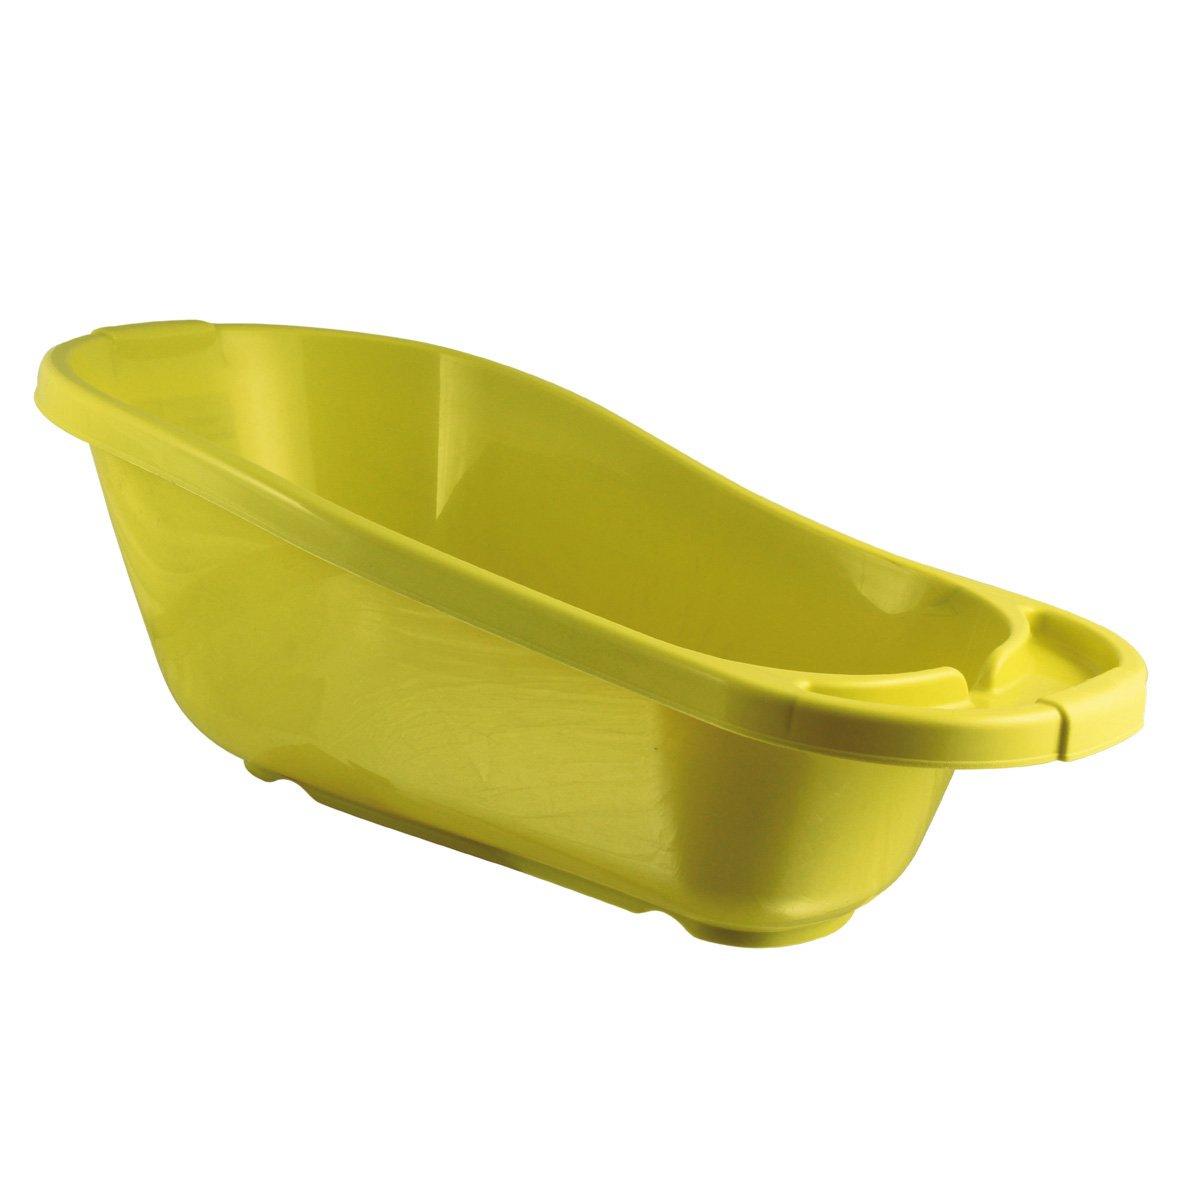 Vasca da bagno in plastica per adulti - Piscina plastica rigida ...